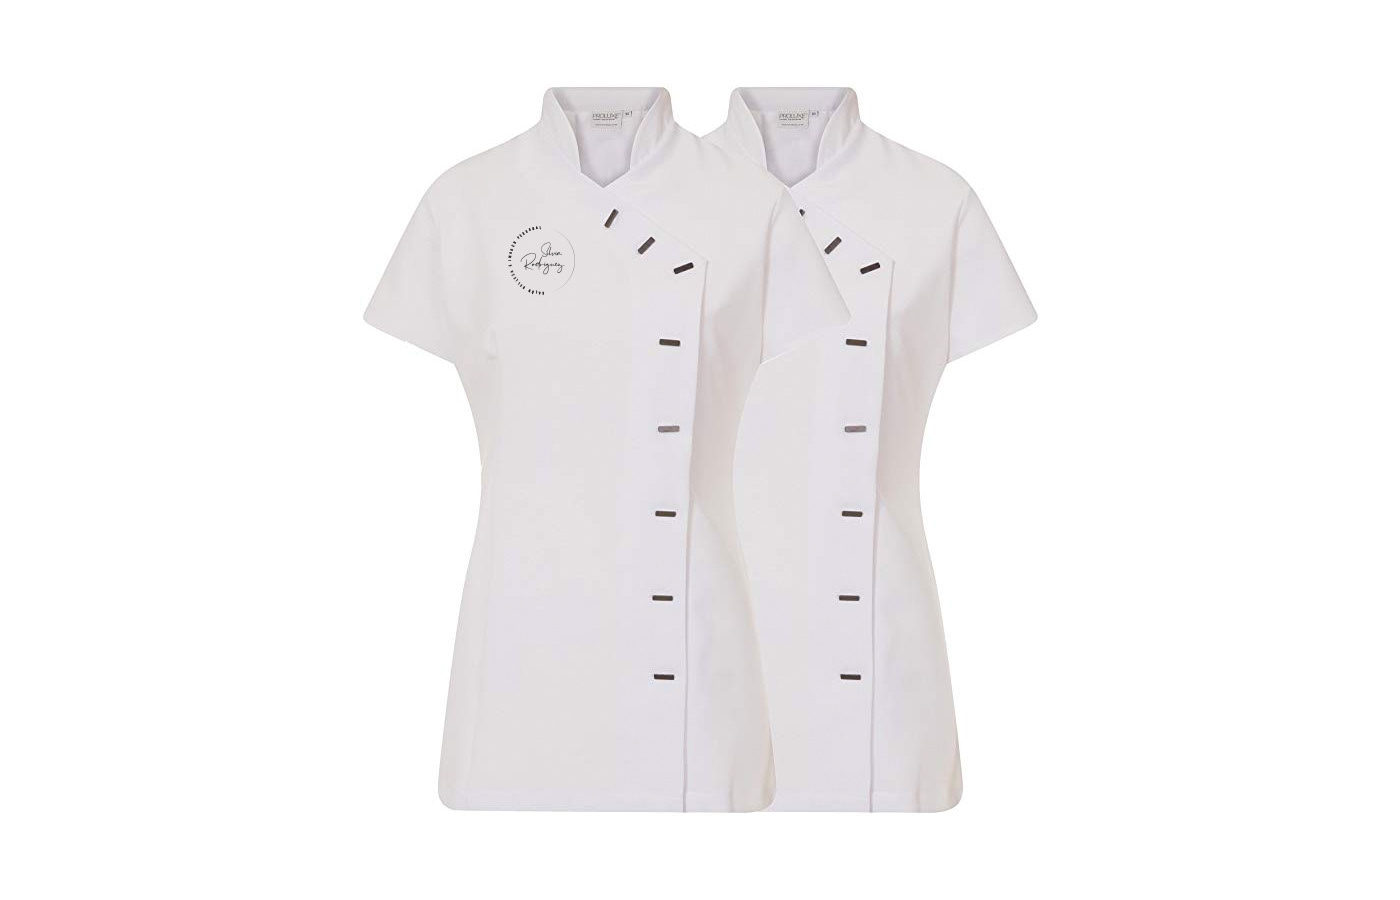 Image may contain: clothing, shirt and sleeve